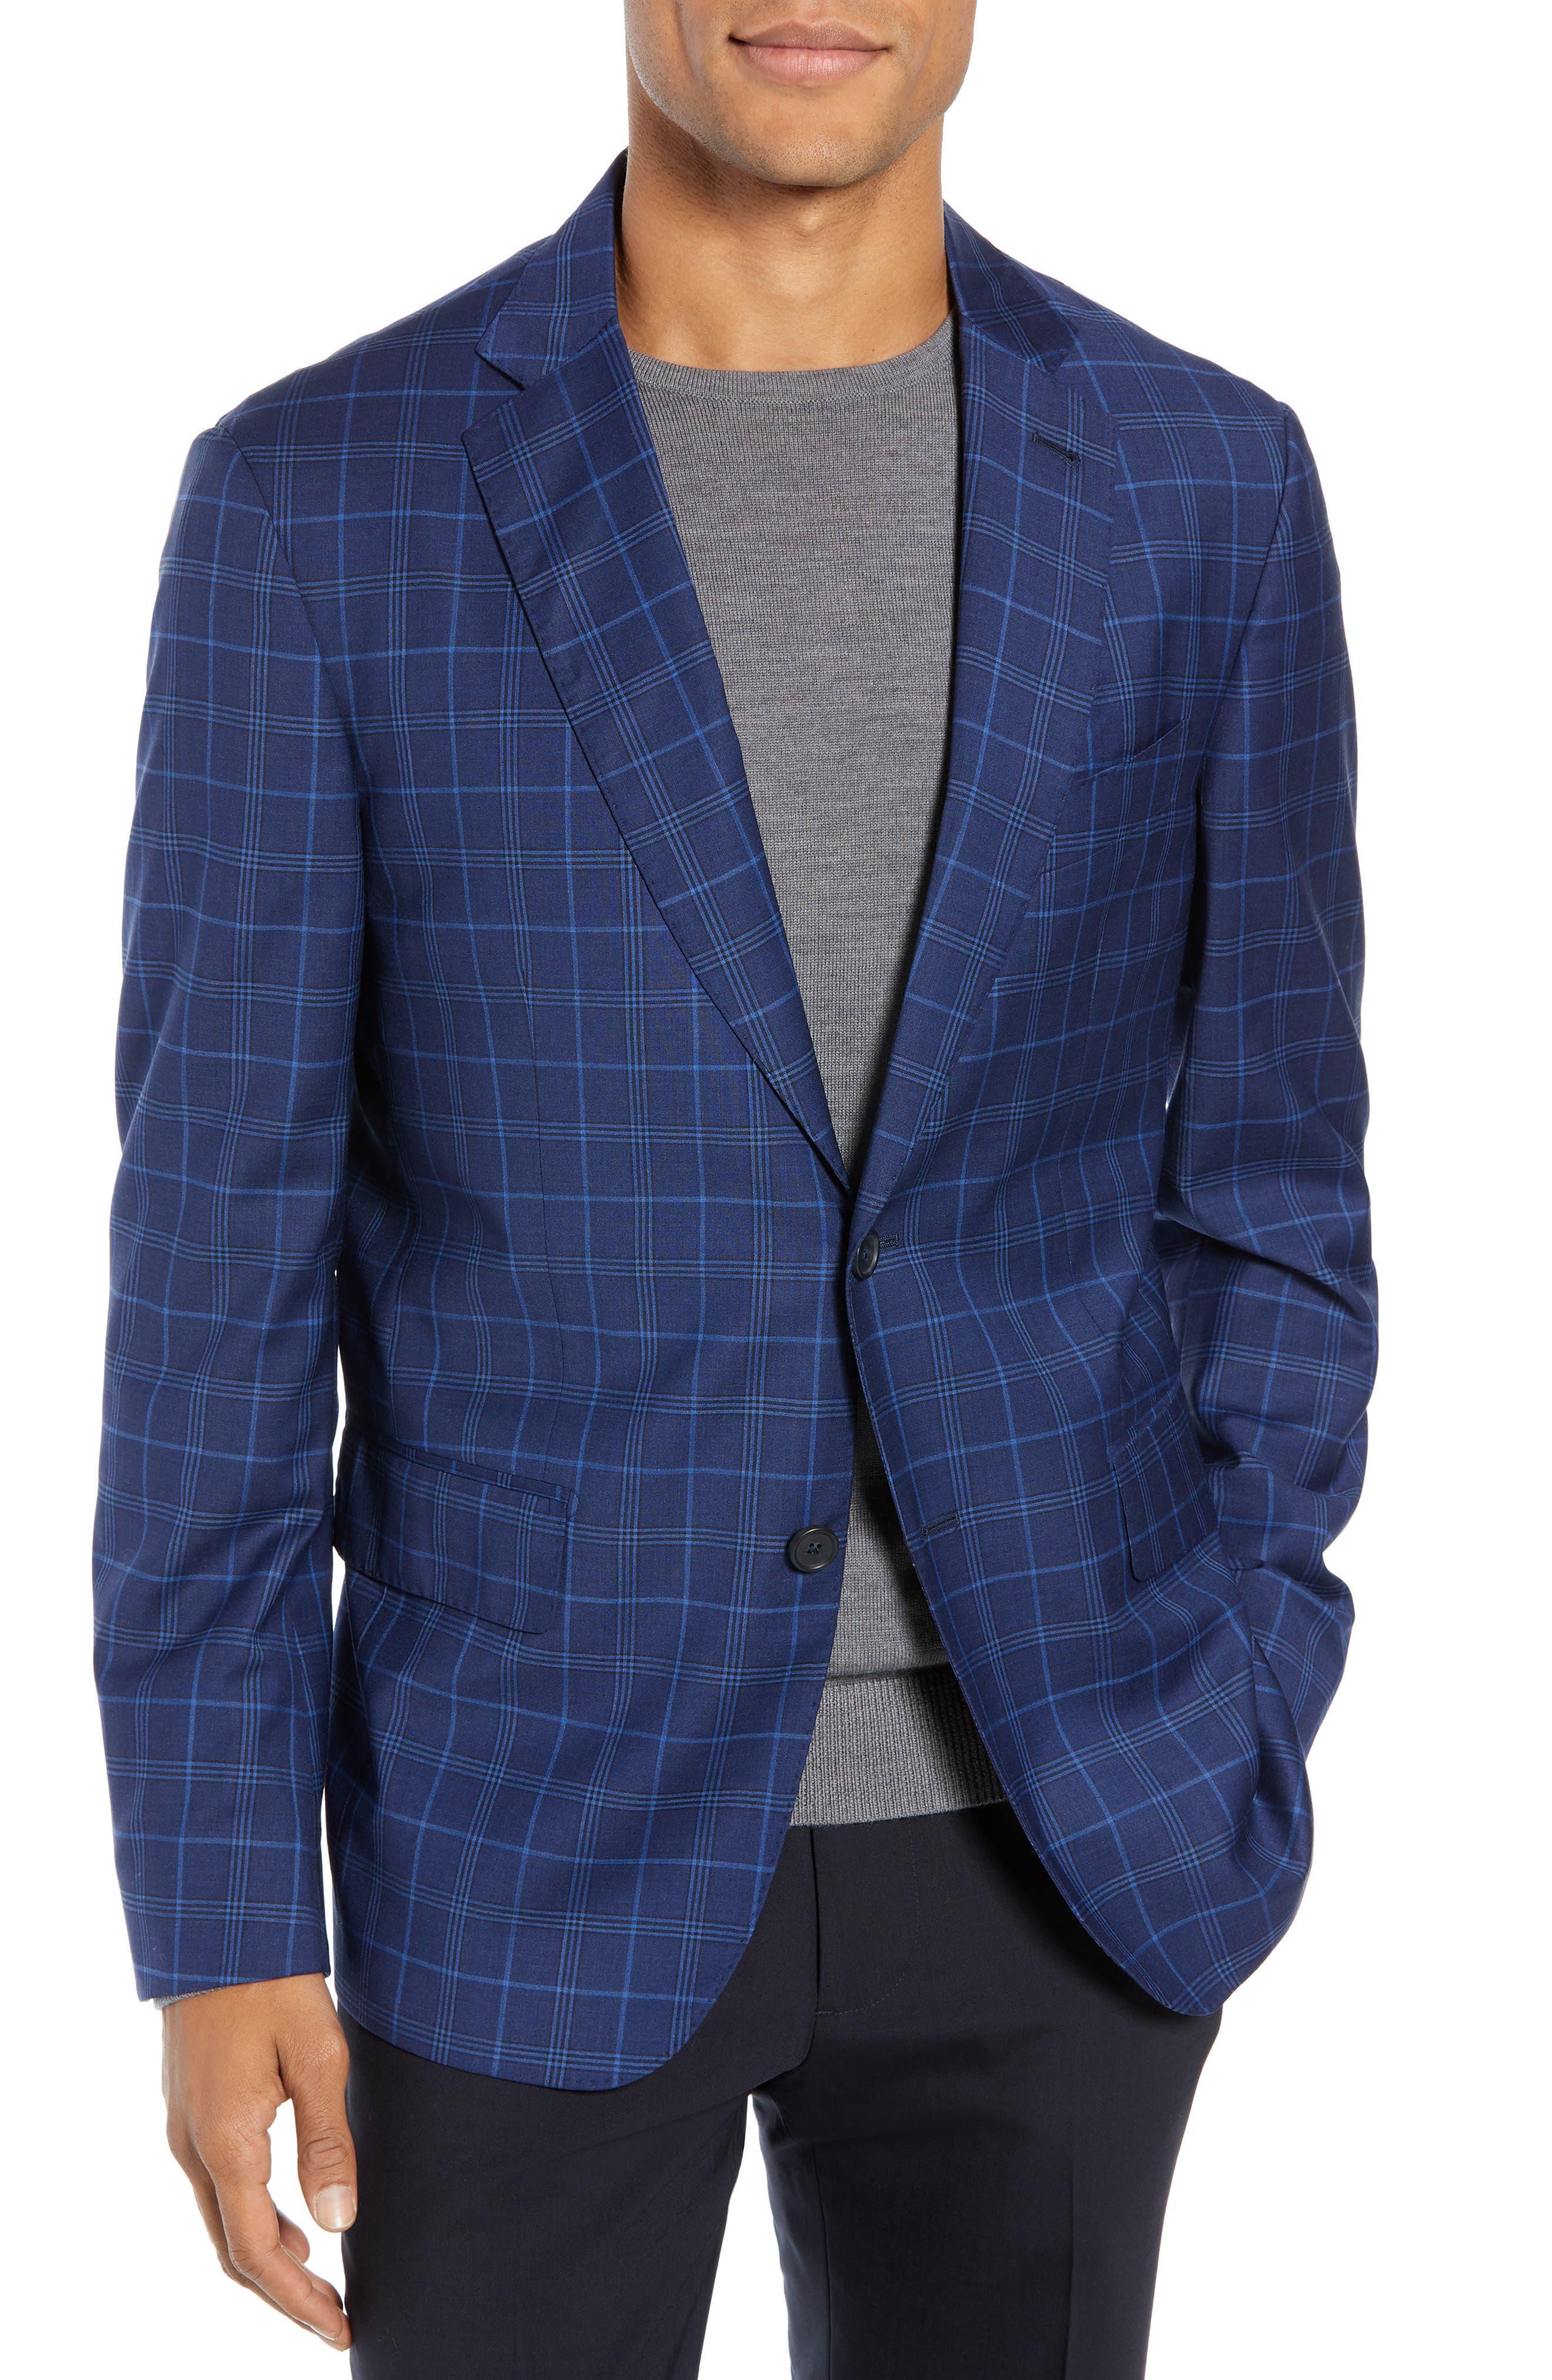 JOHN W. NORDSTROM<SUP>®</SUP>, Traditional Fit Plaid Wool Sport Coat, Main thumbnail 1, color, NAVY IRIS BLUE WINDOWPANE